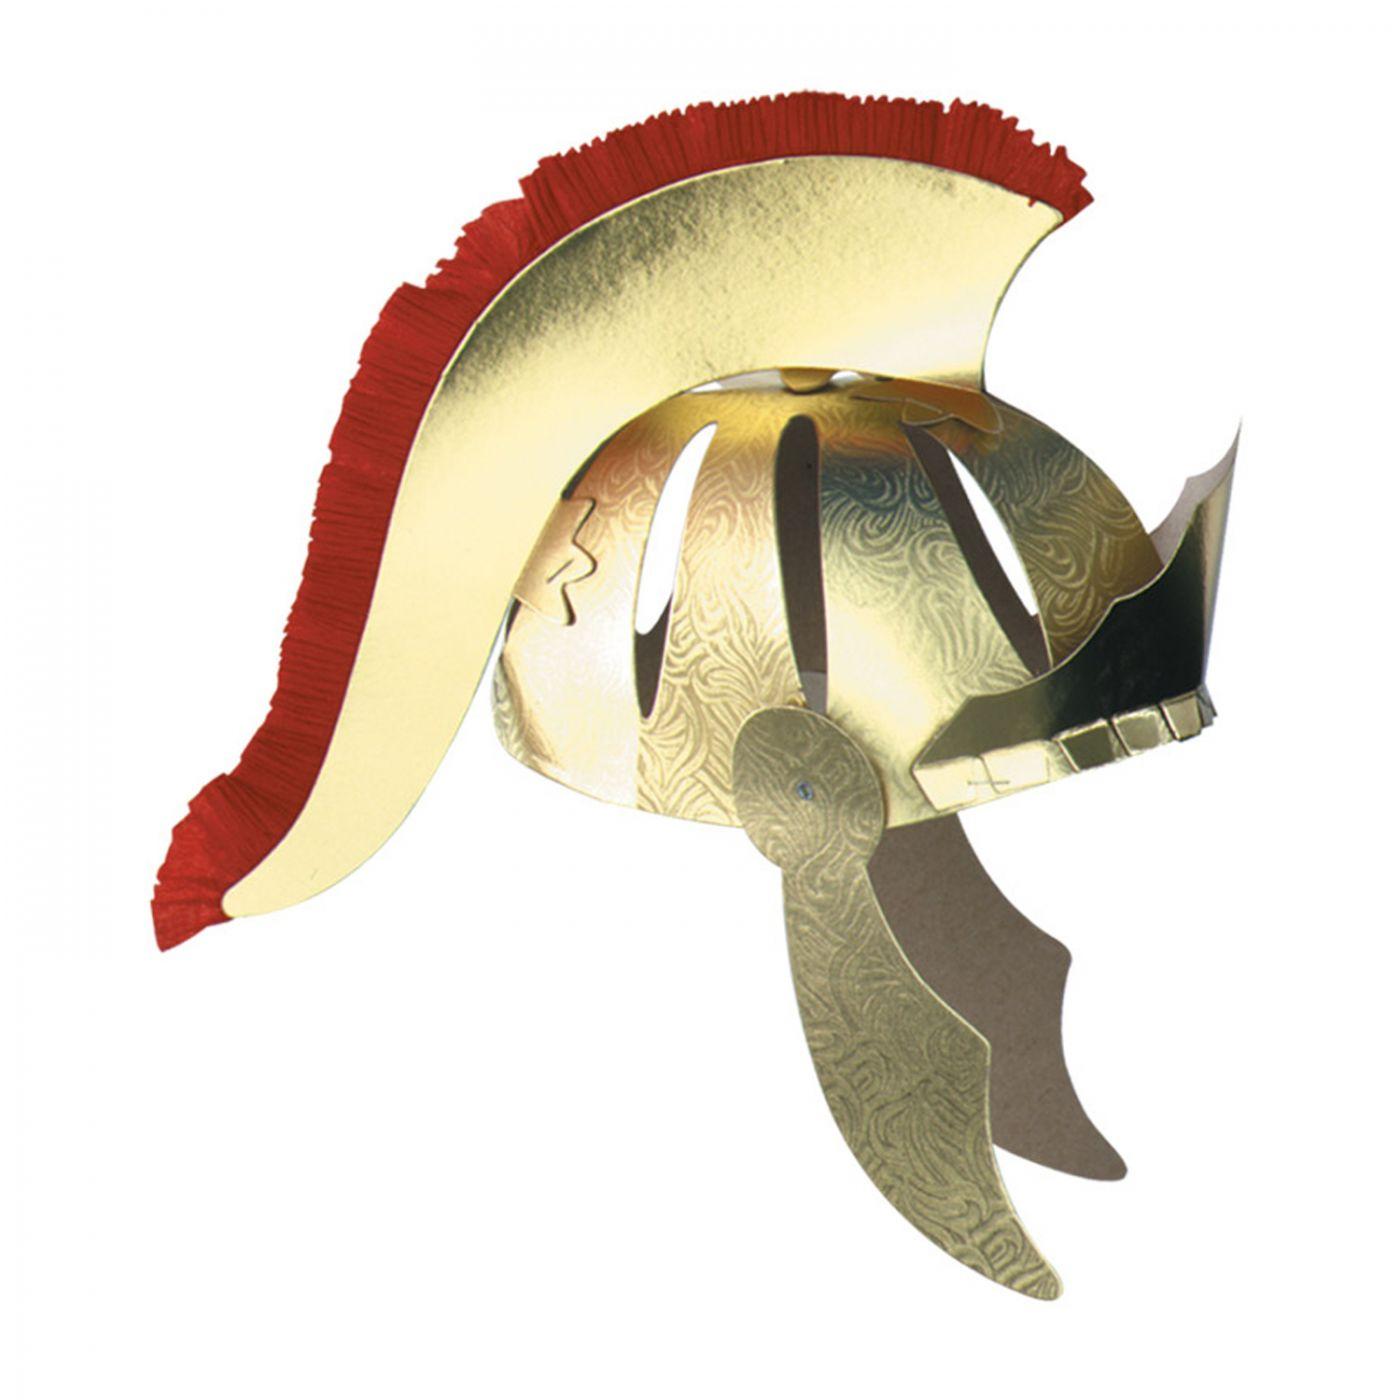 Roman Helmet image